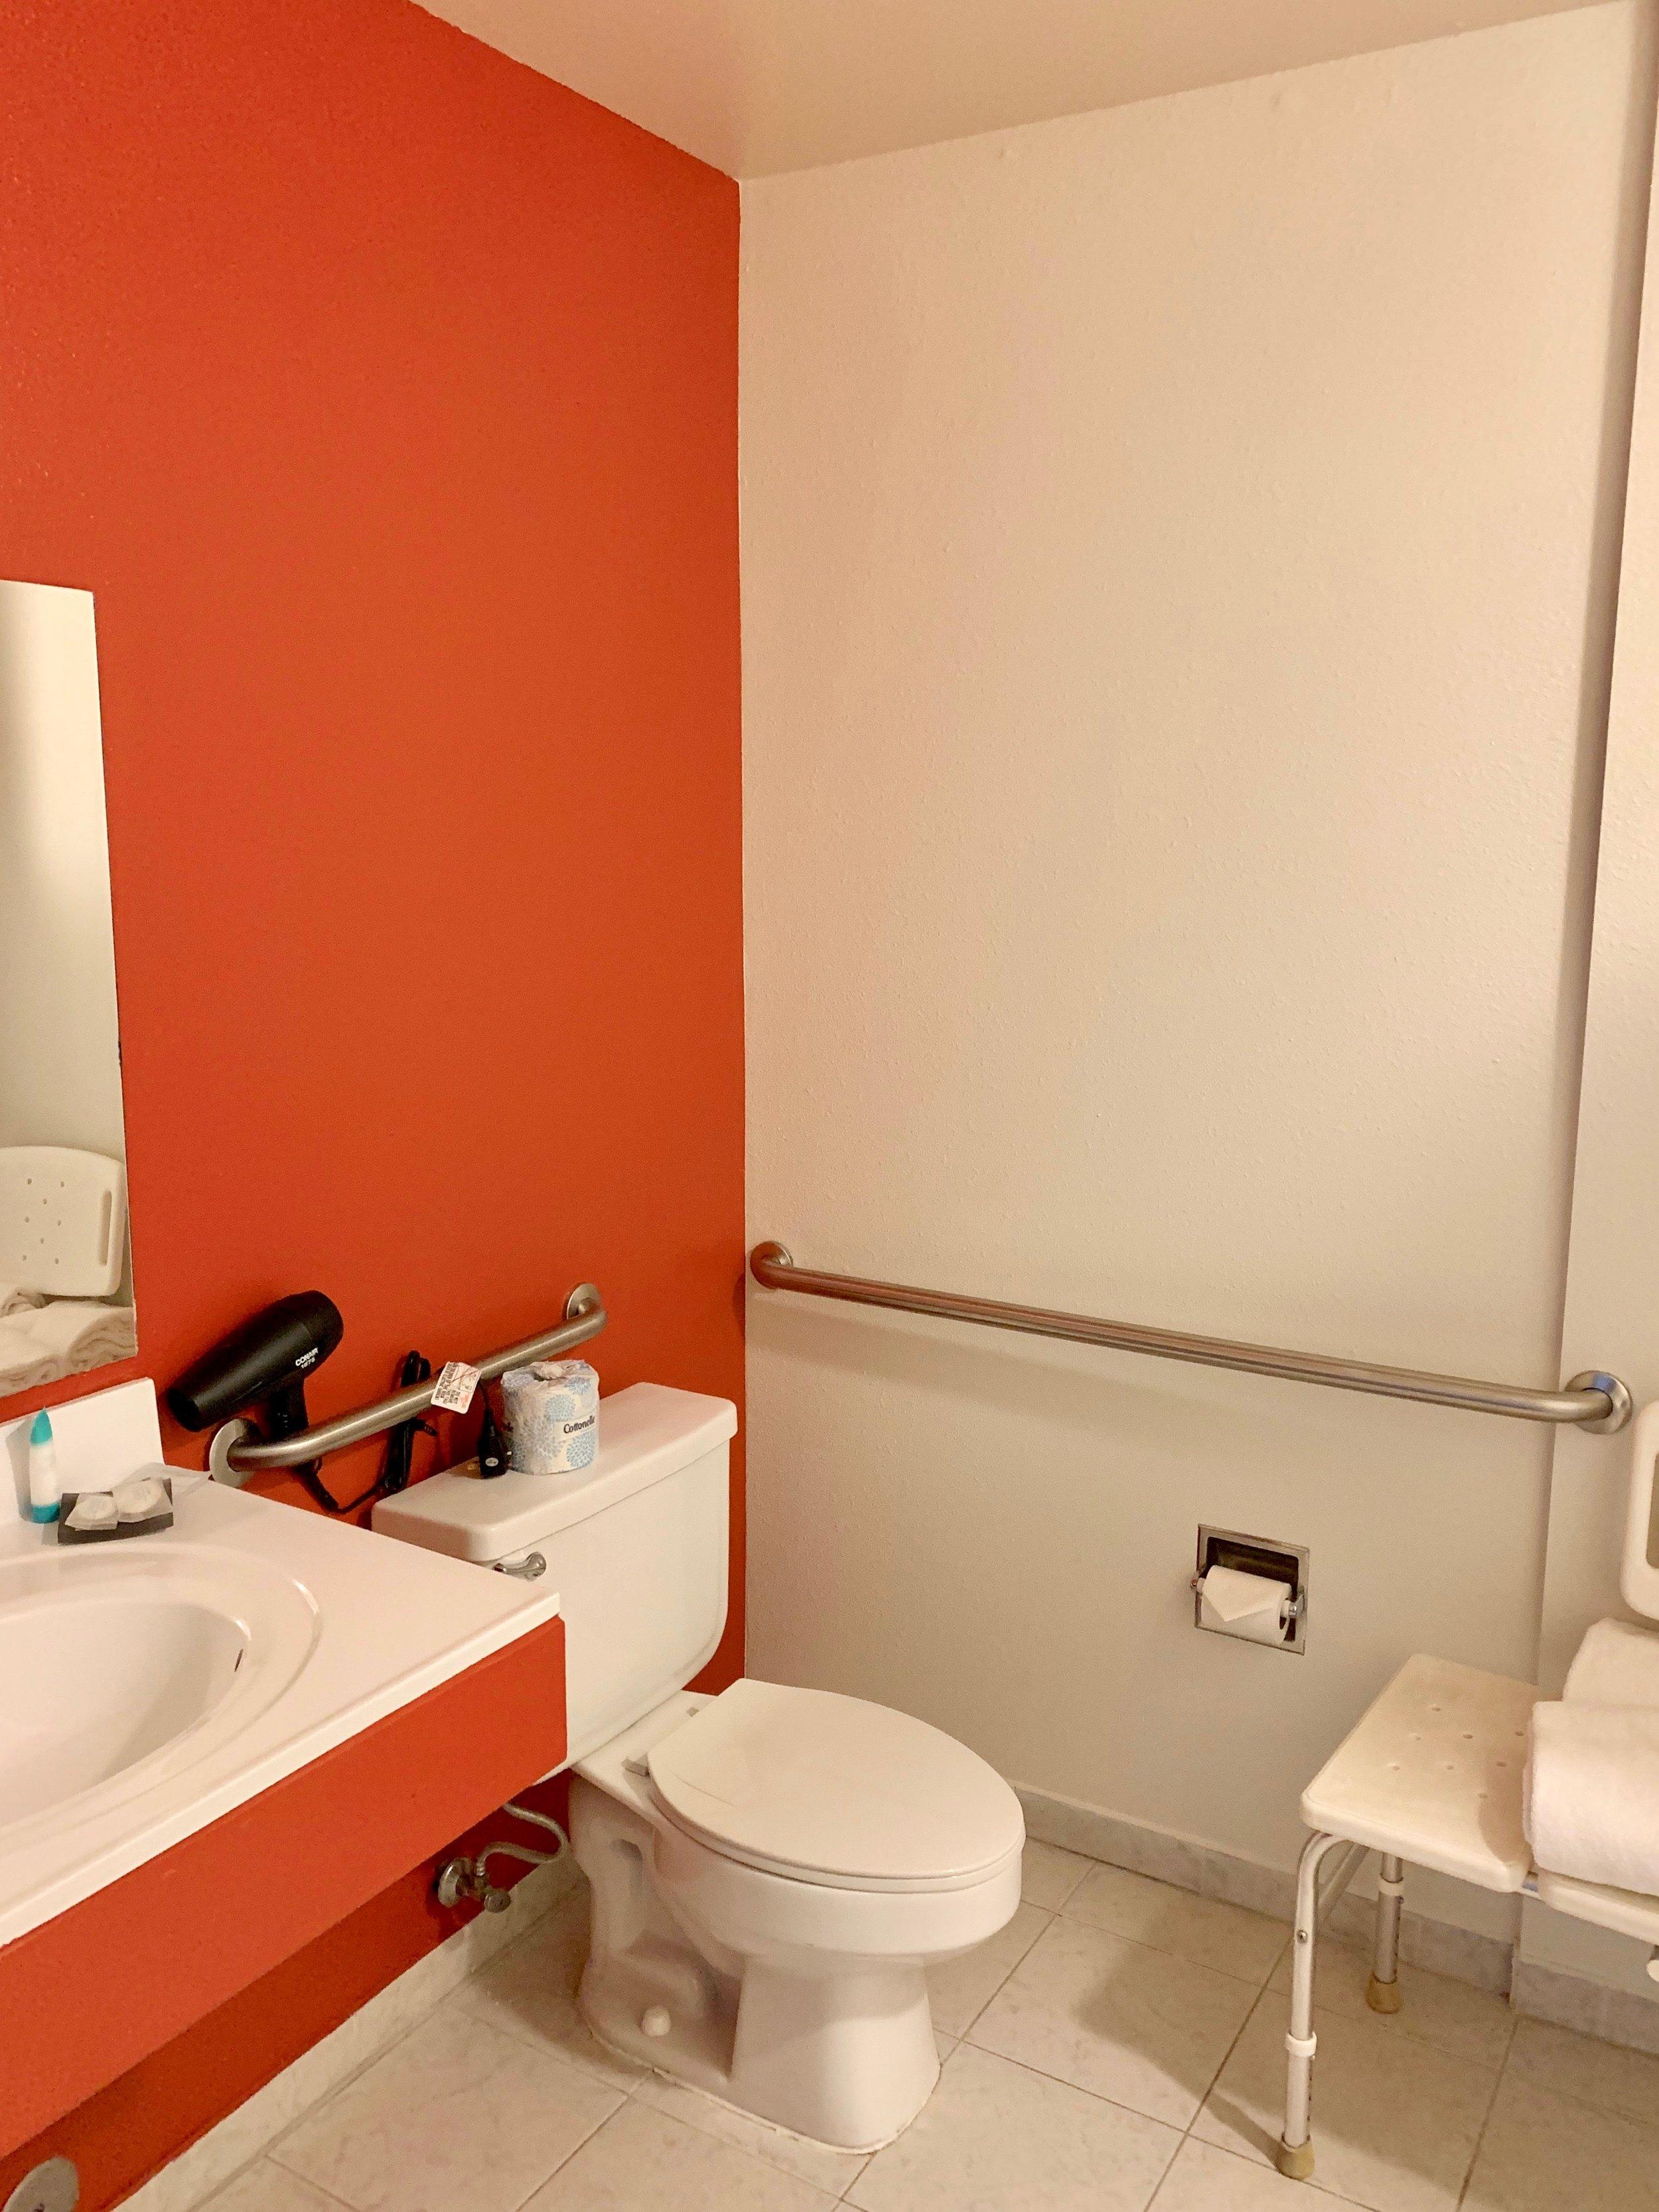 Loyal Duke Queen Accessible Bathroom 1Edited.jpg